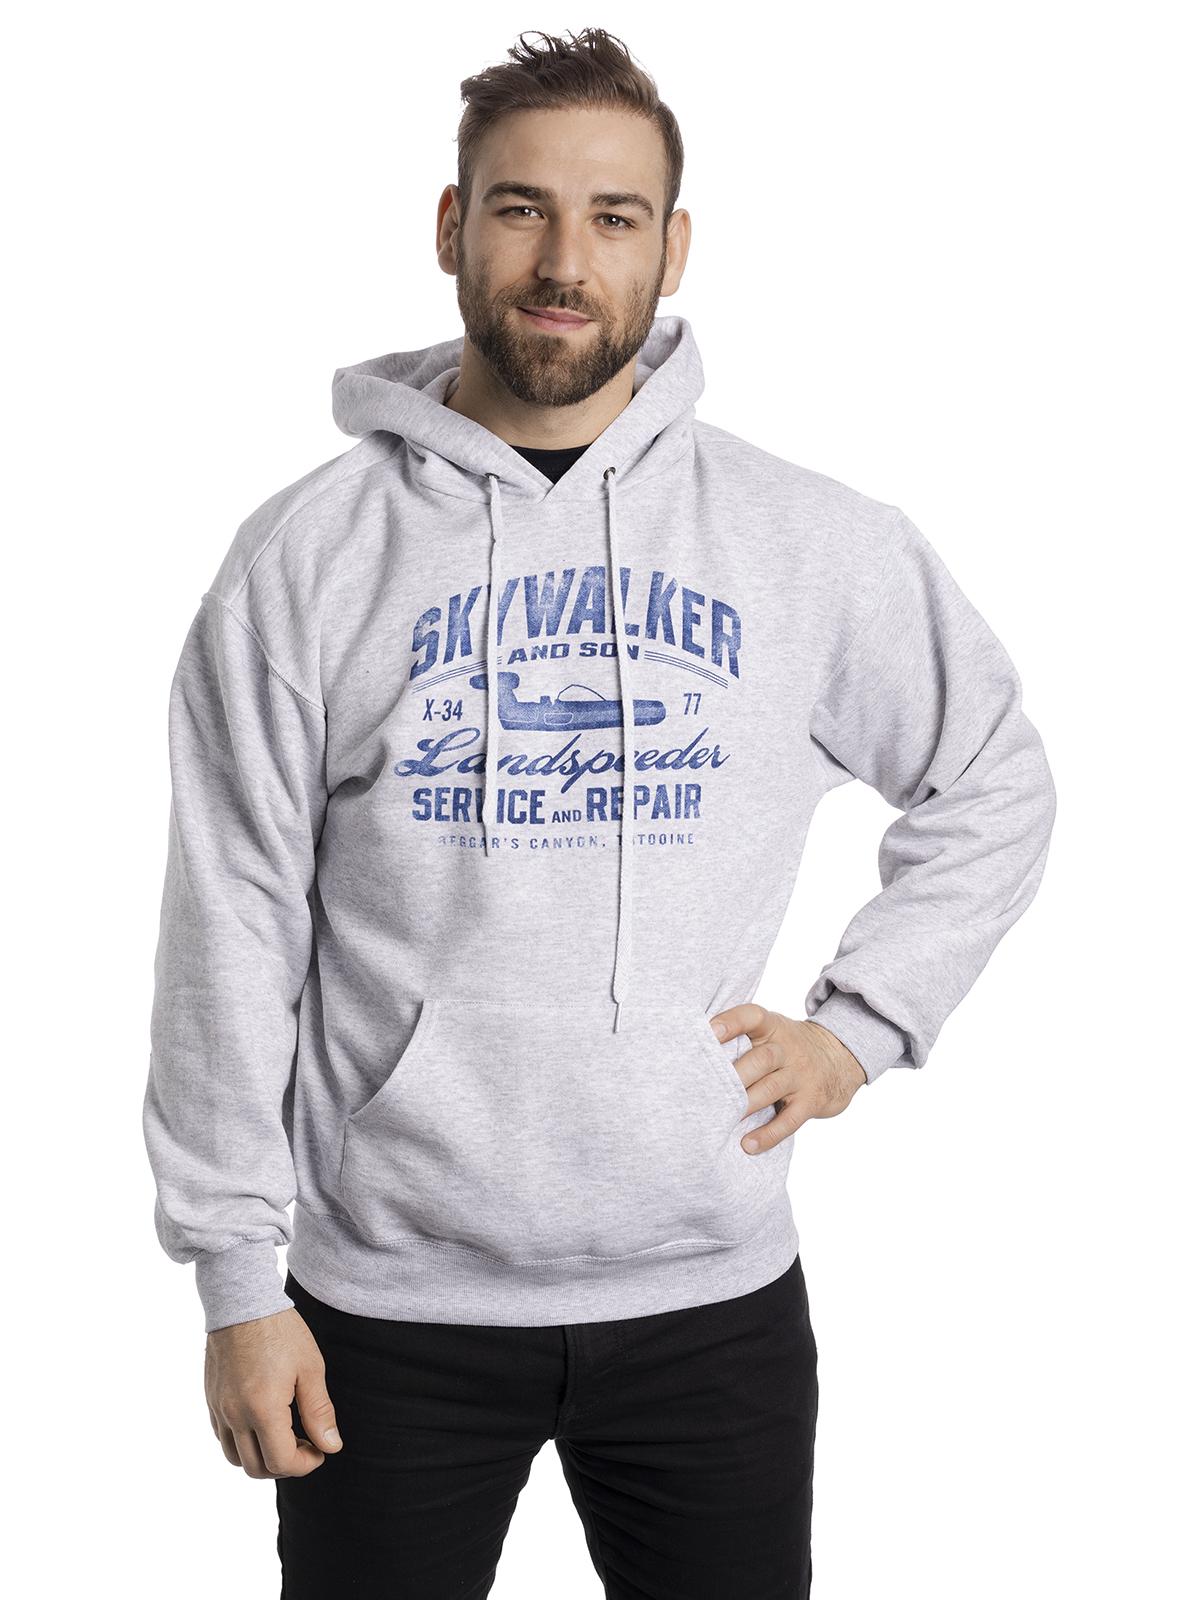 Nützlichfanartikel - Star Wars Skywalker Hooded Sweater grau meliert – Größe L - Onlineshop NAPO Shop